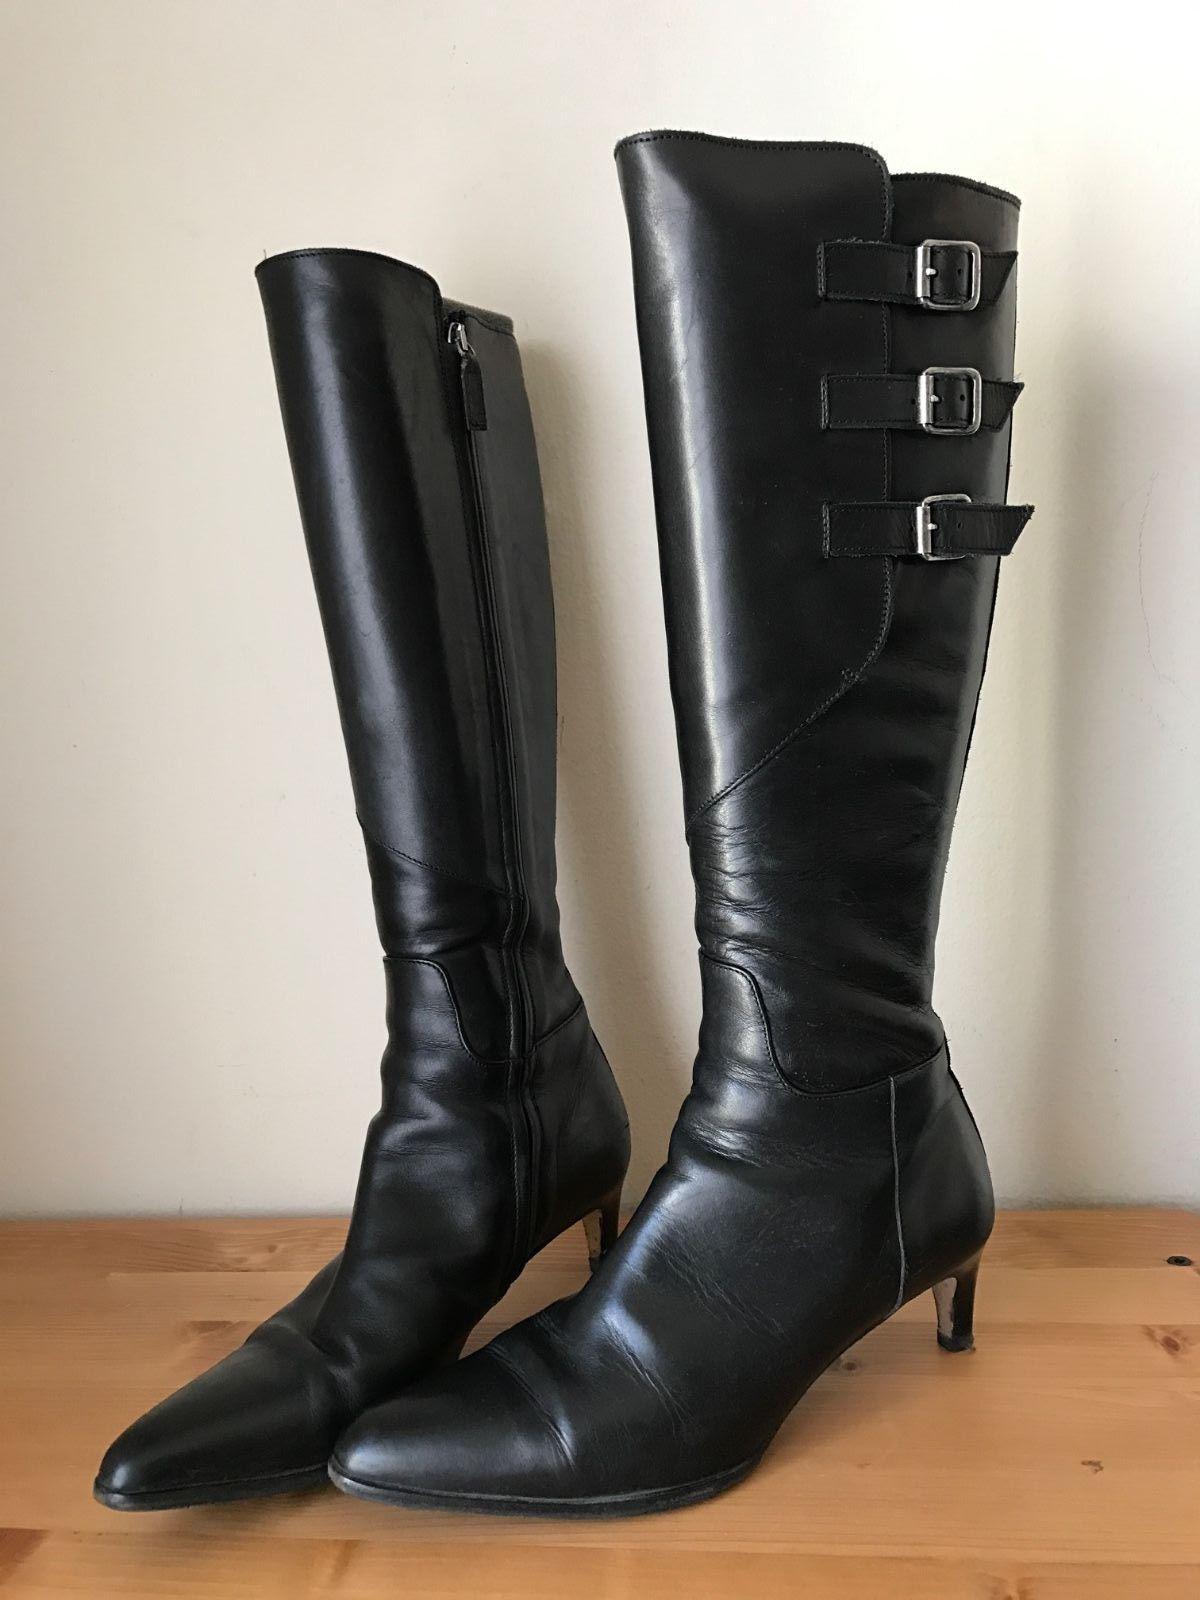 RALPH RALPH RALPH LAUREN Collection schwarz leather buckles pointy tall Stiefel sz 7  37 5f6bb8